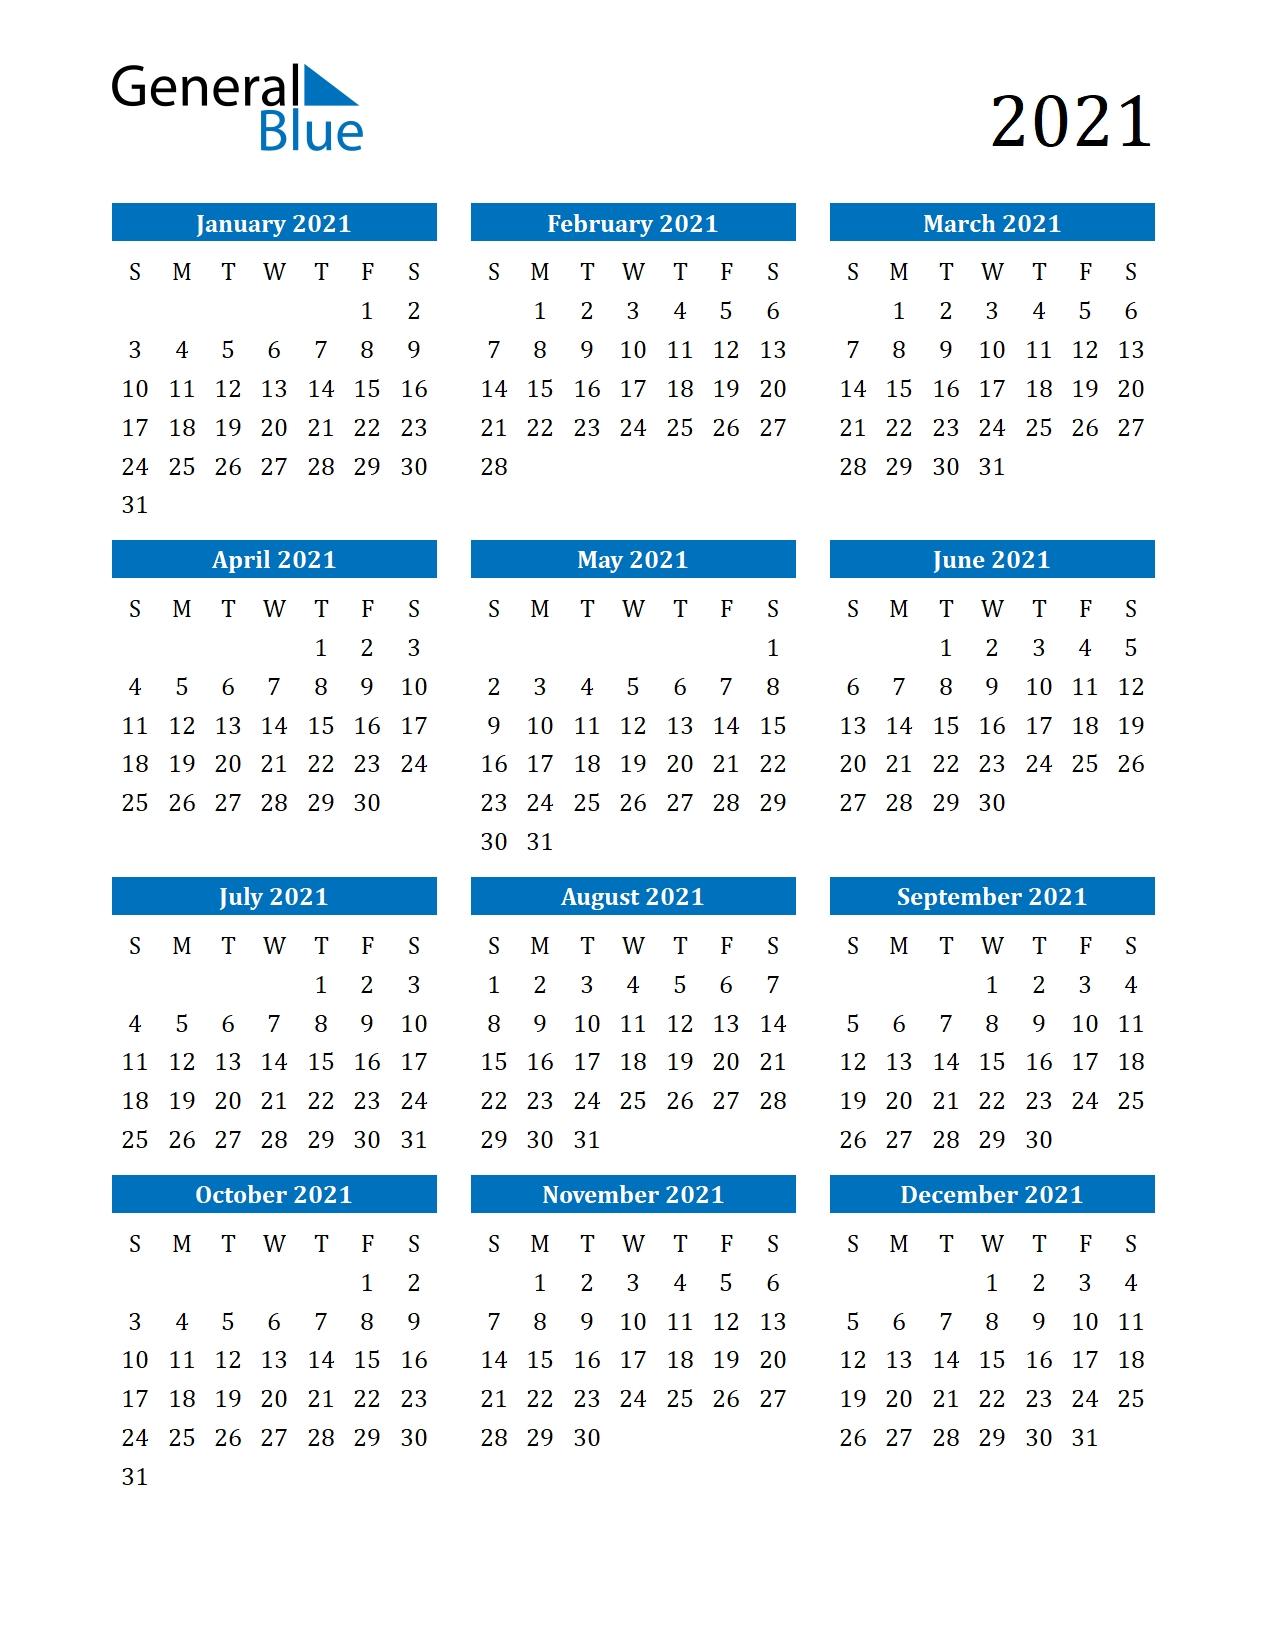 Free Printable Calendar In Pdf, Word And Excel-Calander 2021 June For Bills